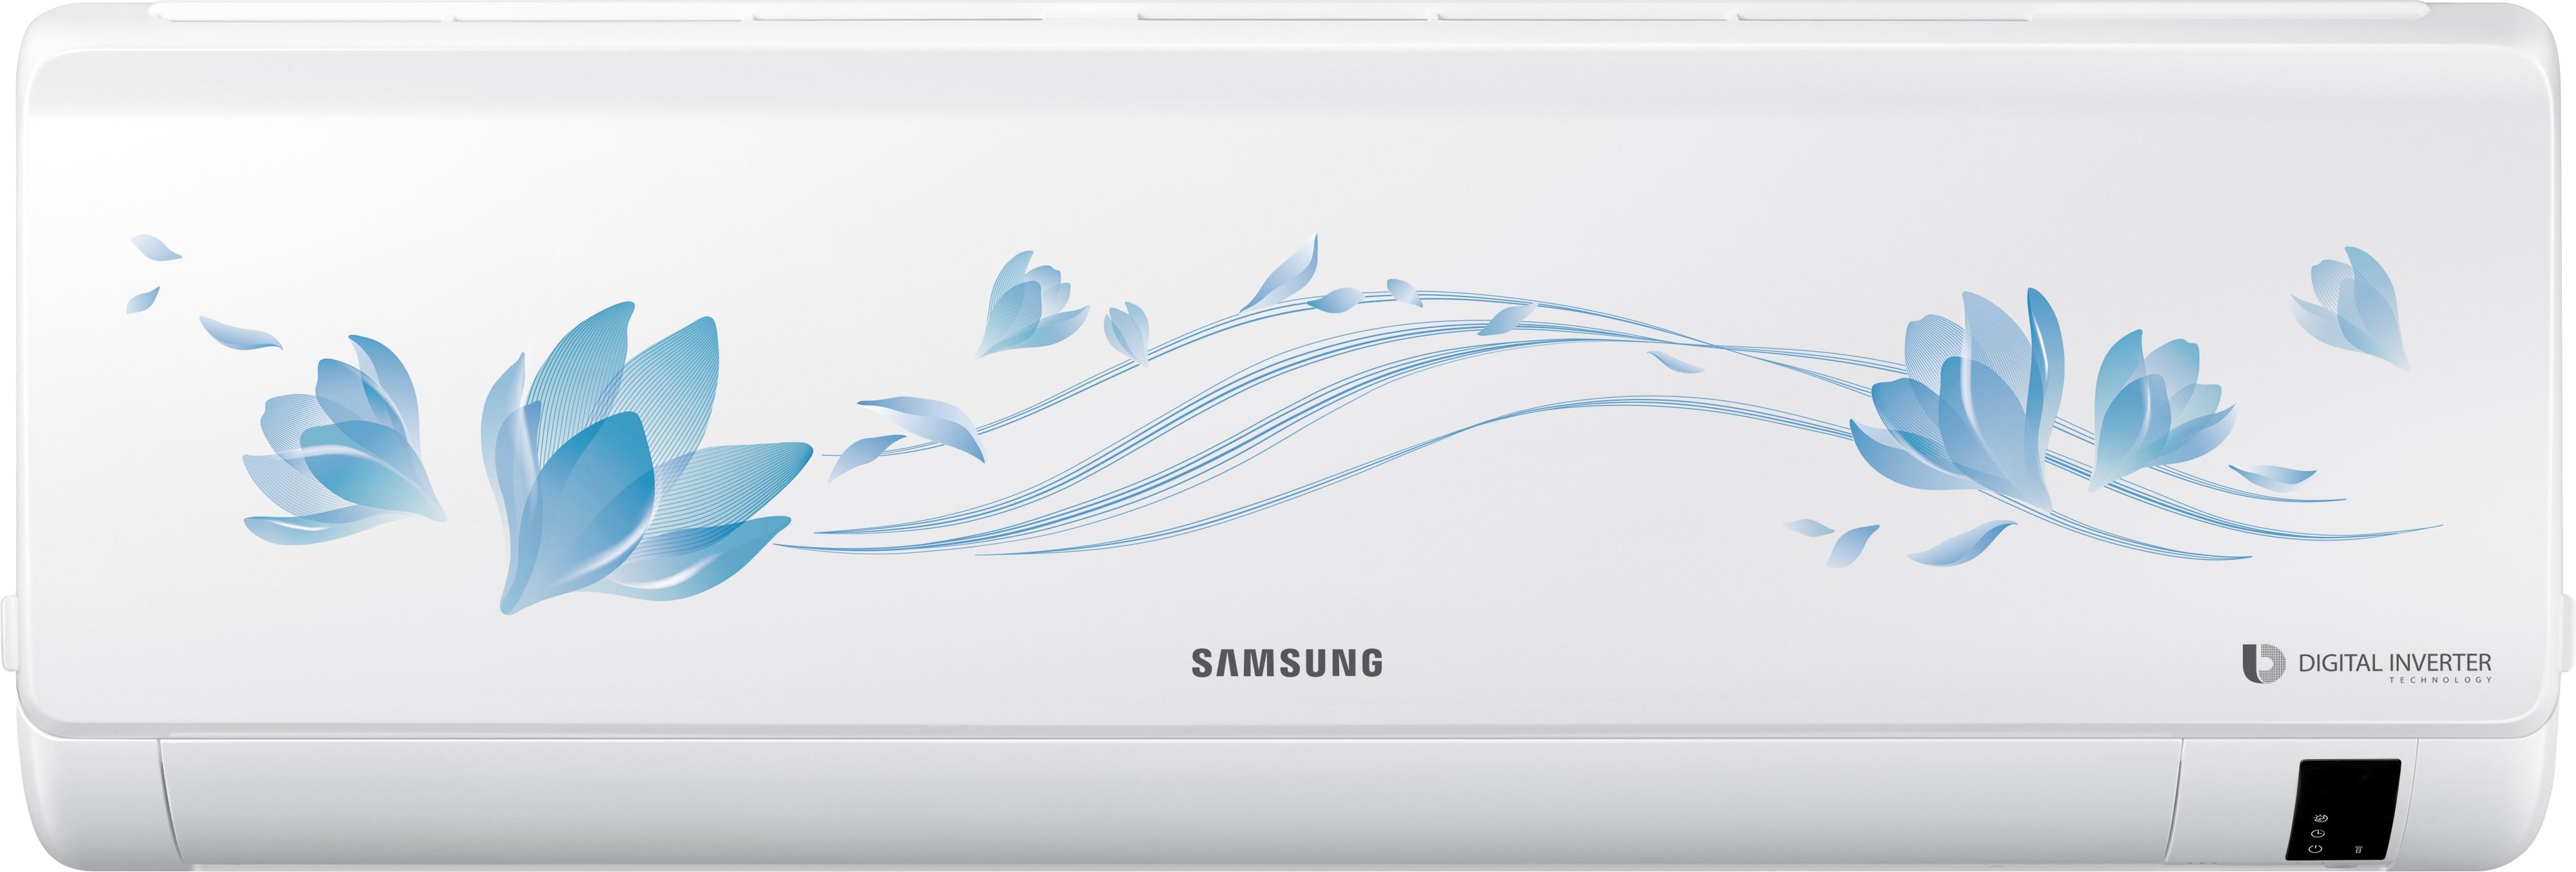 Samsung AR18NV5HETU 1.5 Ton 5 Star BEE Rating 2018 Inverter AC Image